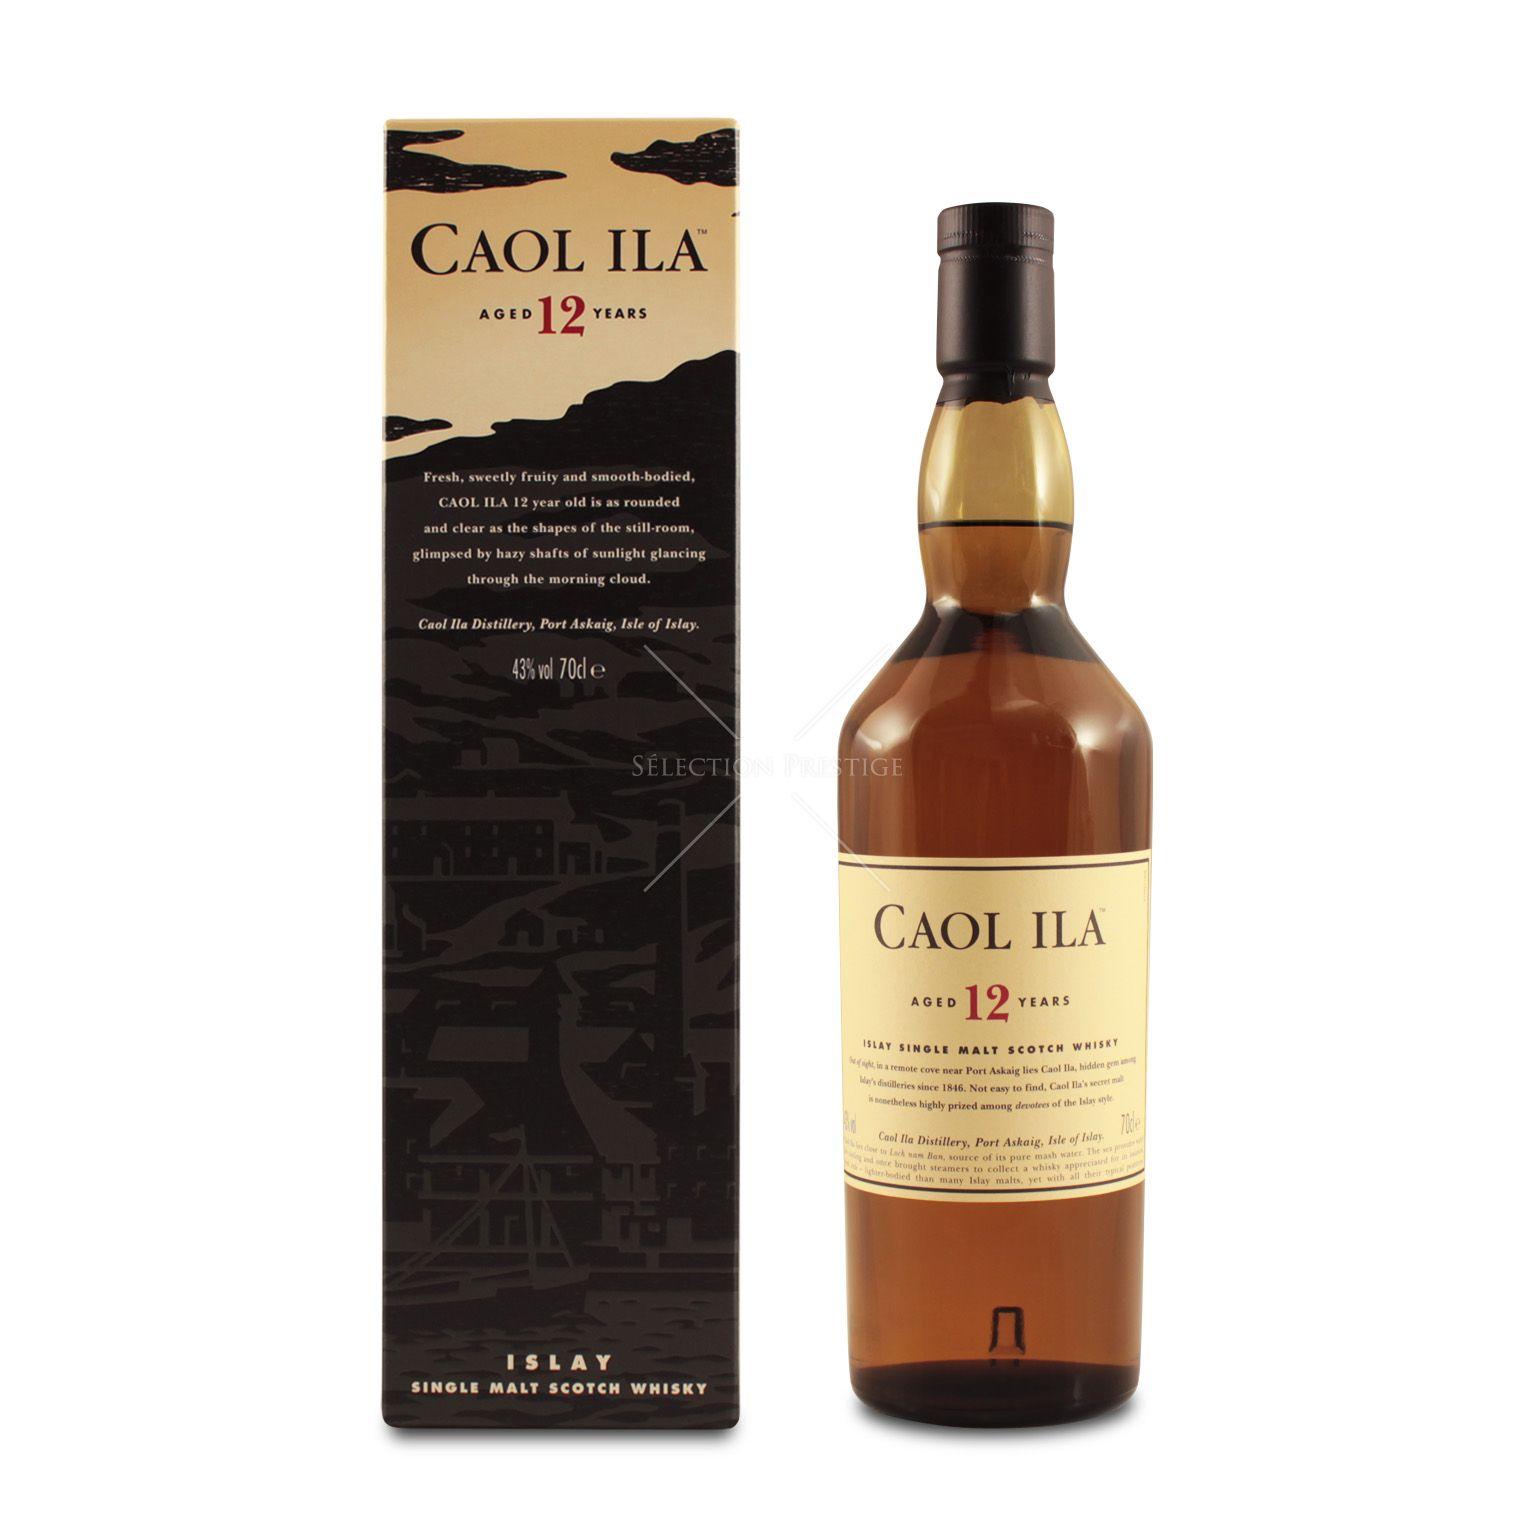 Caol Ila 12 Years Old Islay Single Malt Scotch Whisky 70cl £33.49 @ Amazon